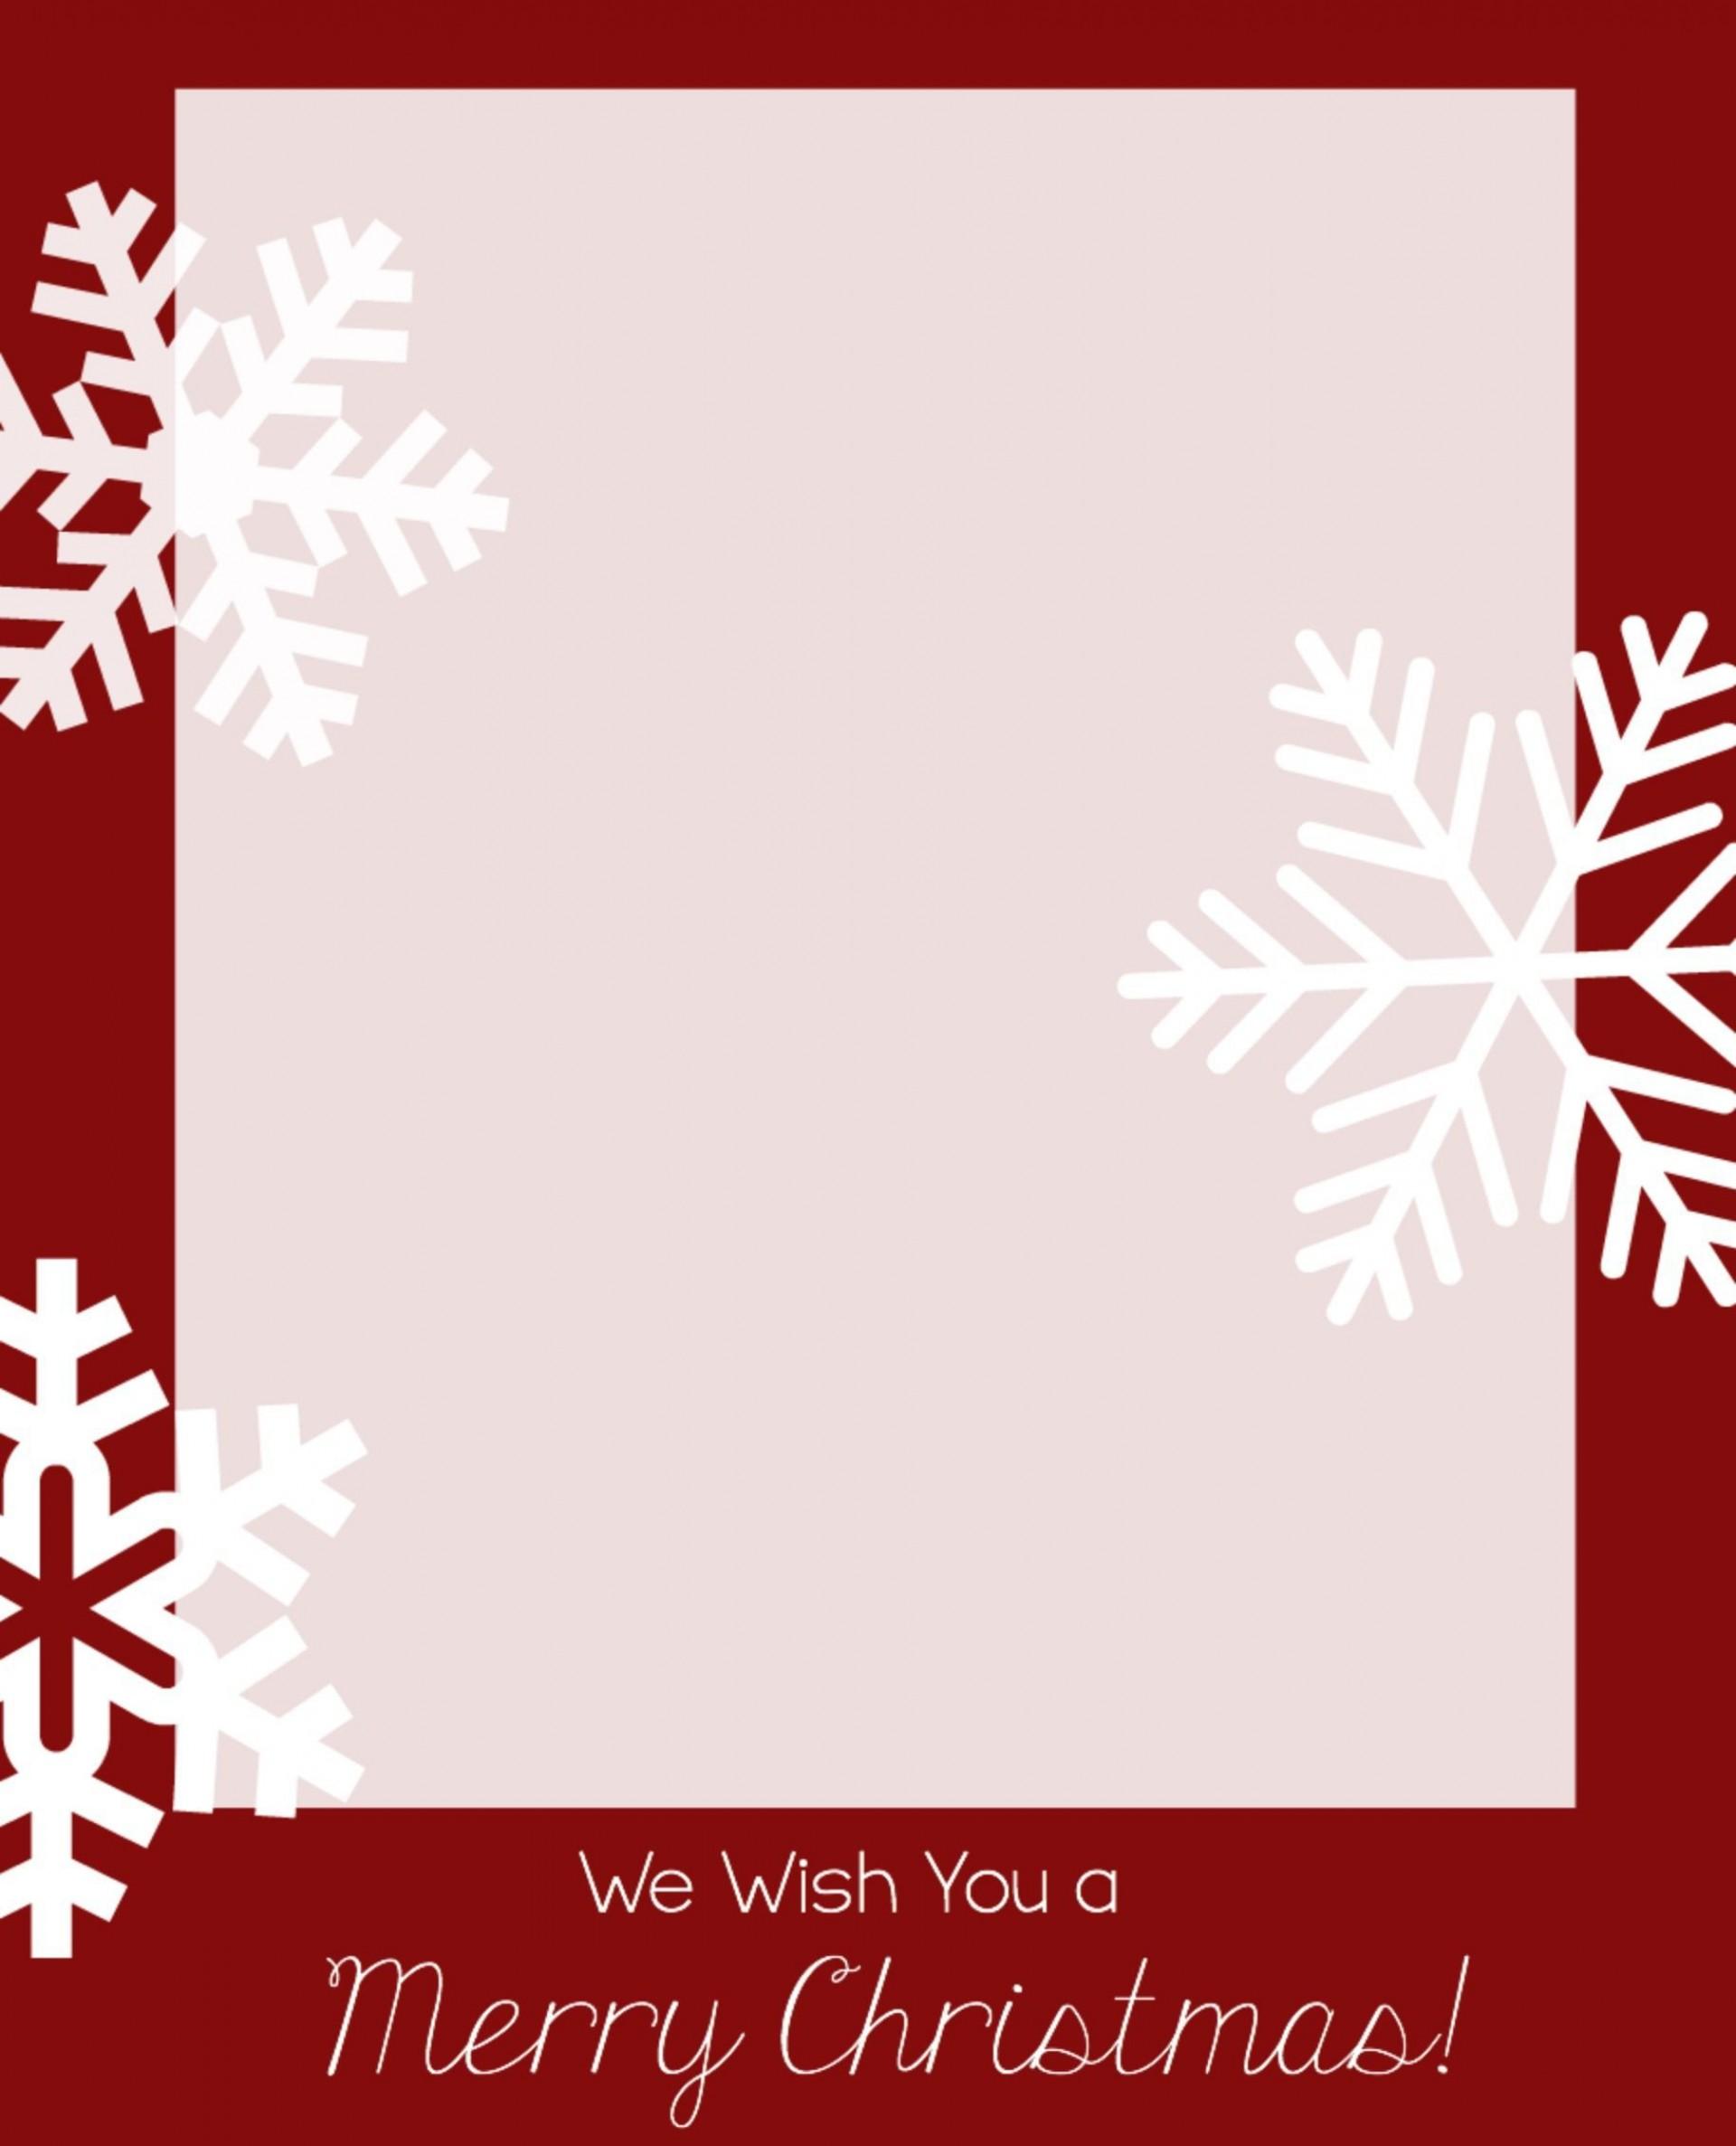 000 Fantastic Free Printable Holiday Card Template Idea  Templates Christma Tent Recipe Gift Holder1920